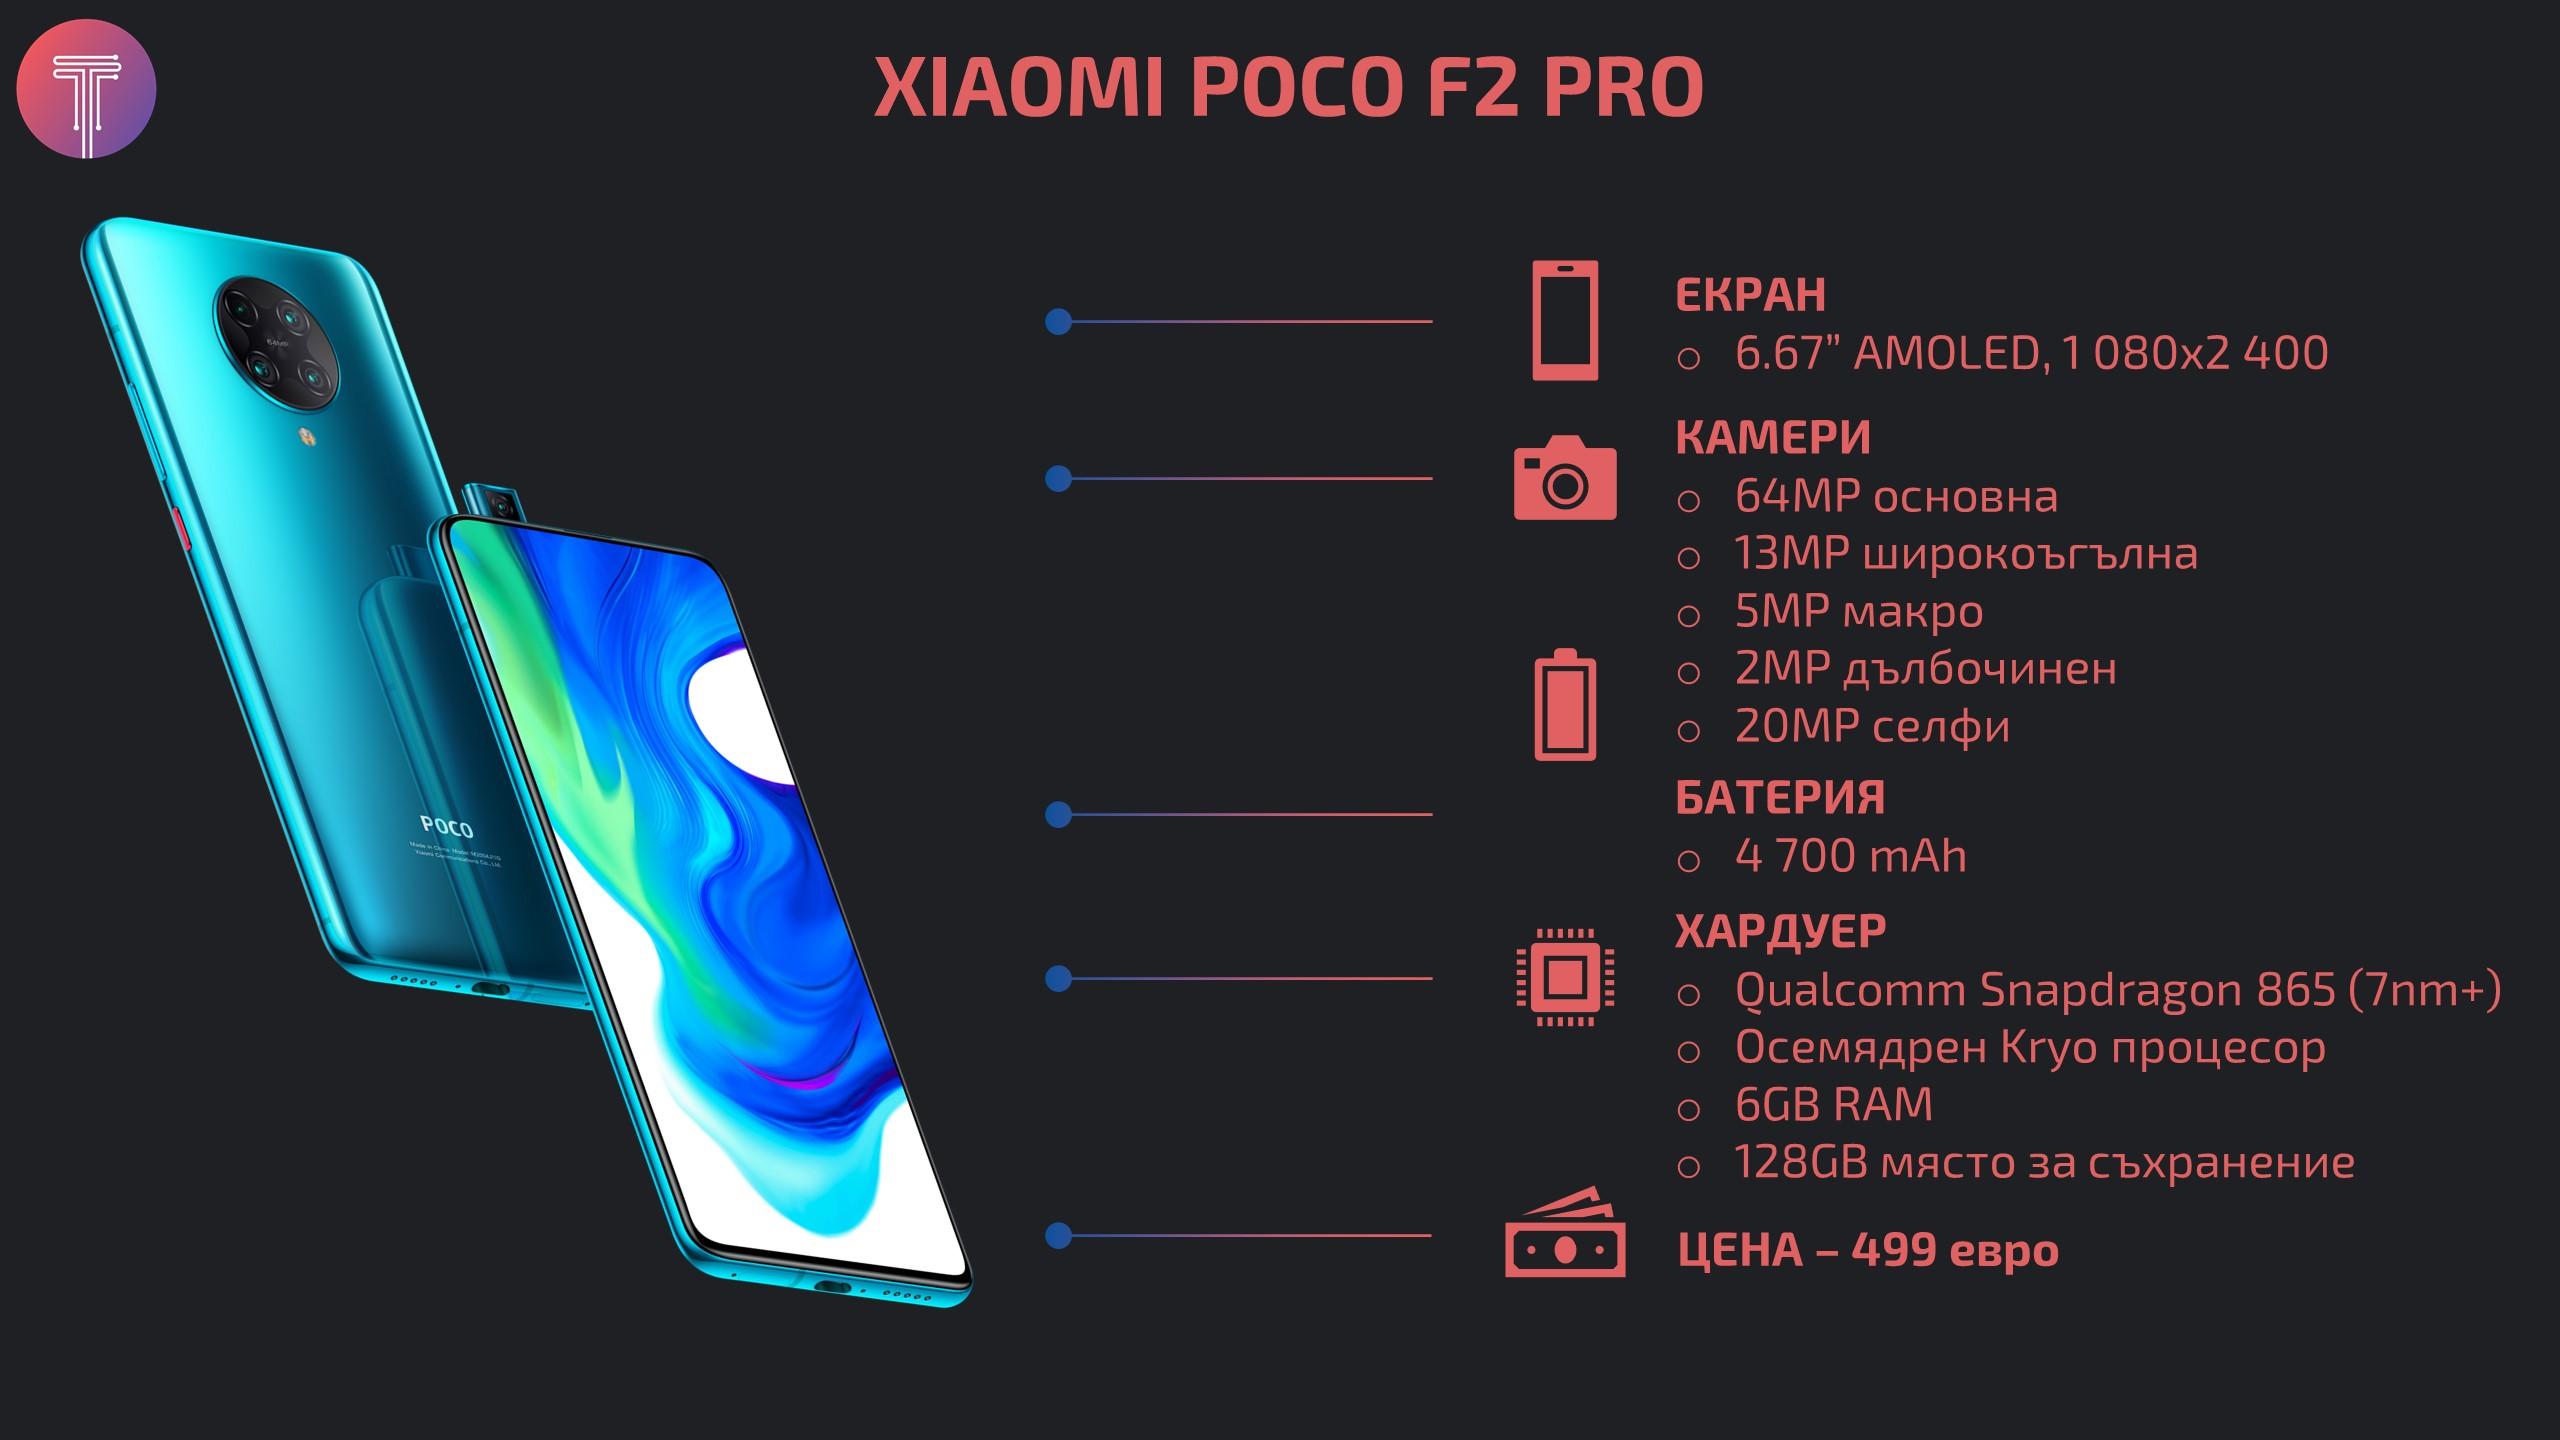 Xiaomi Poco F2 Pro Infographic